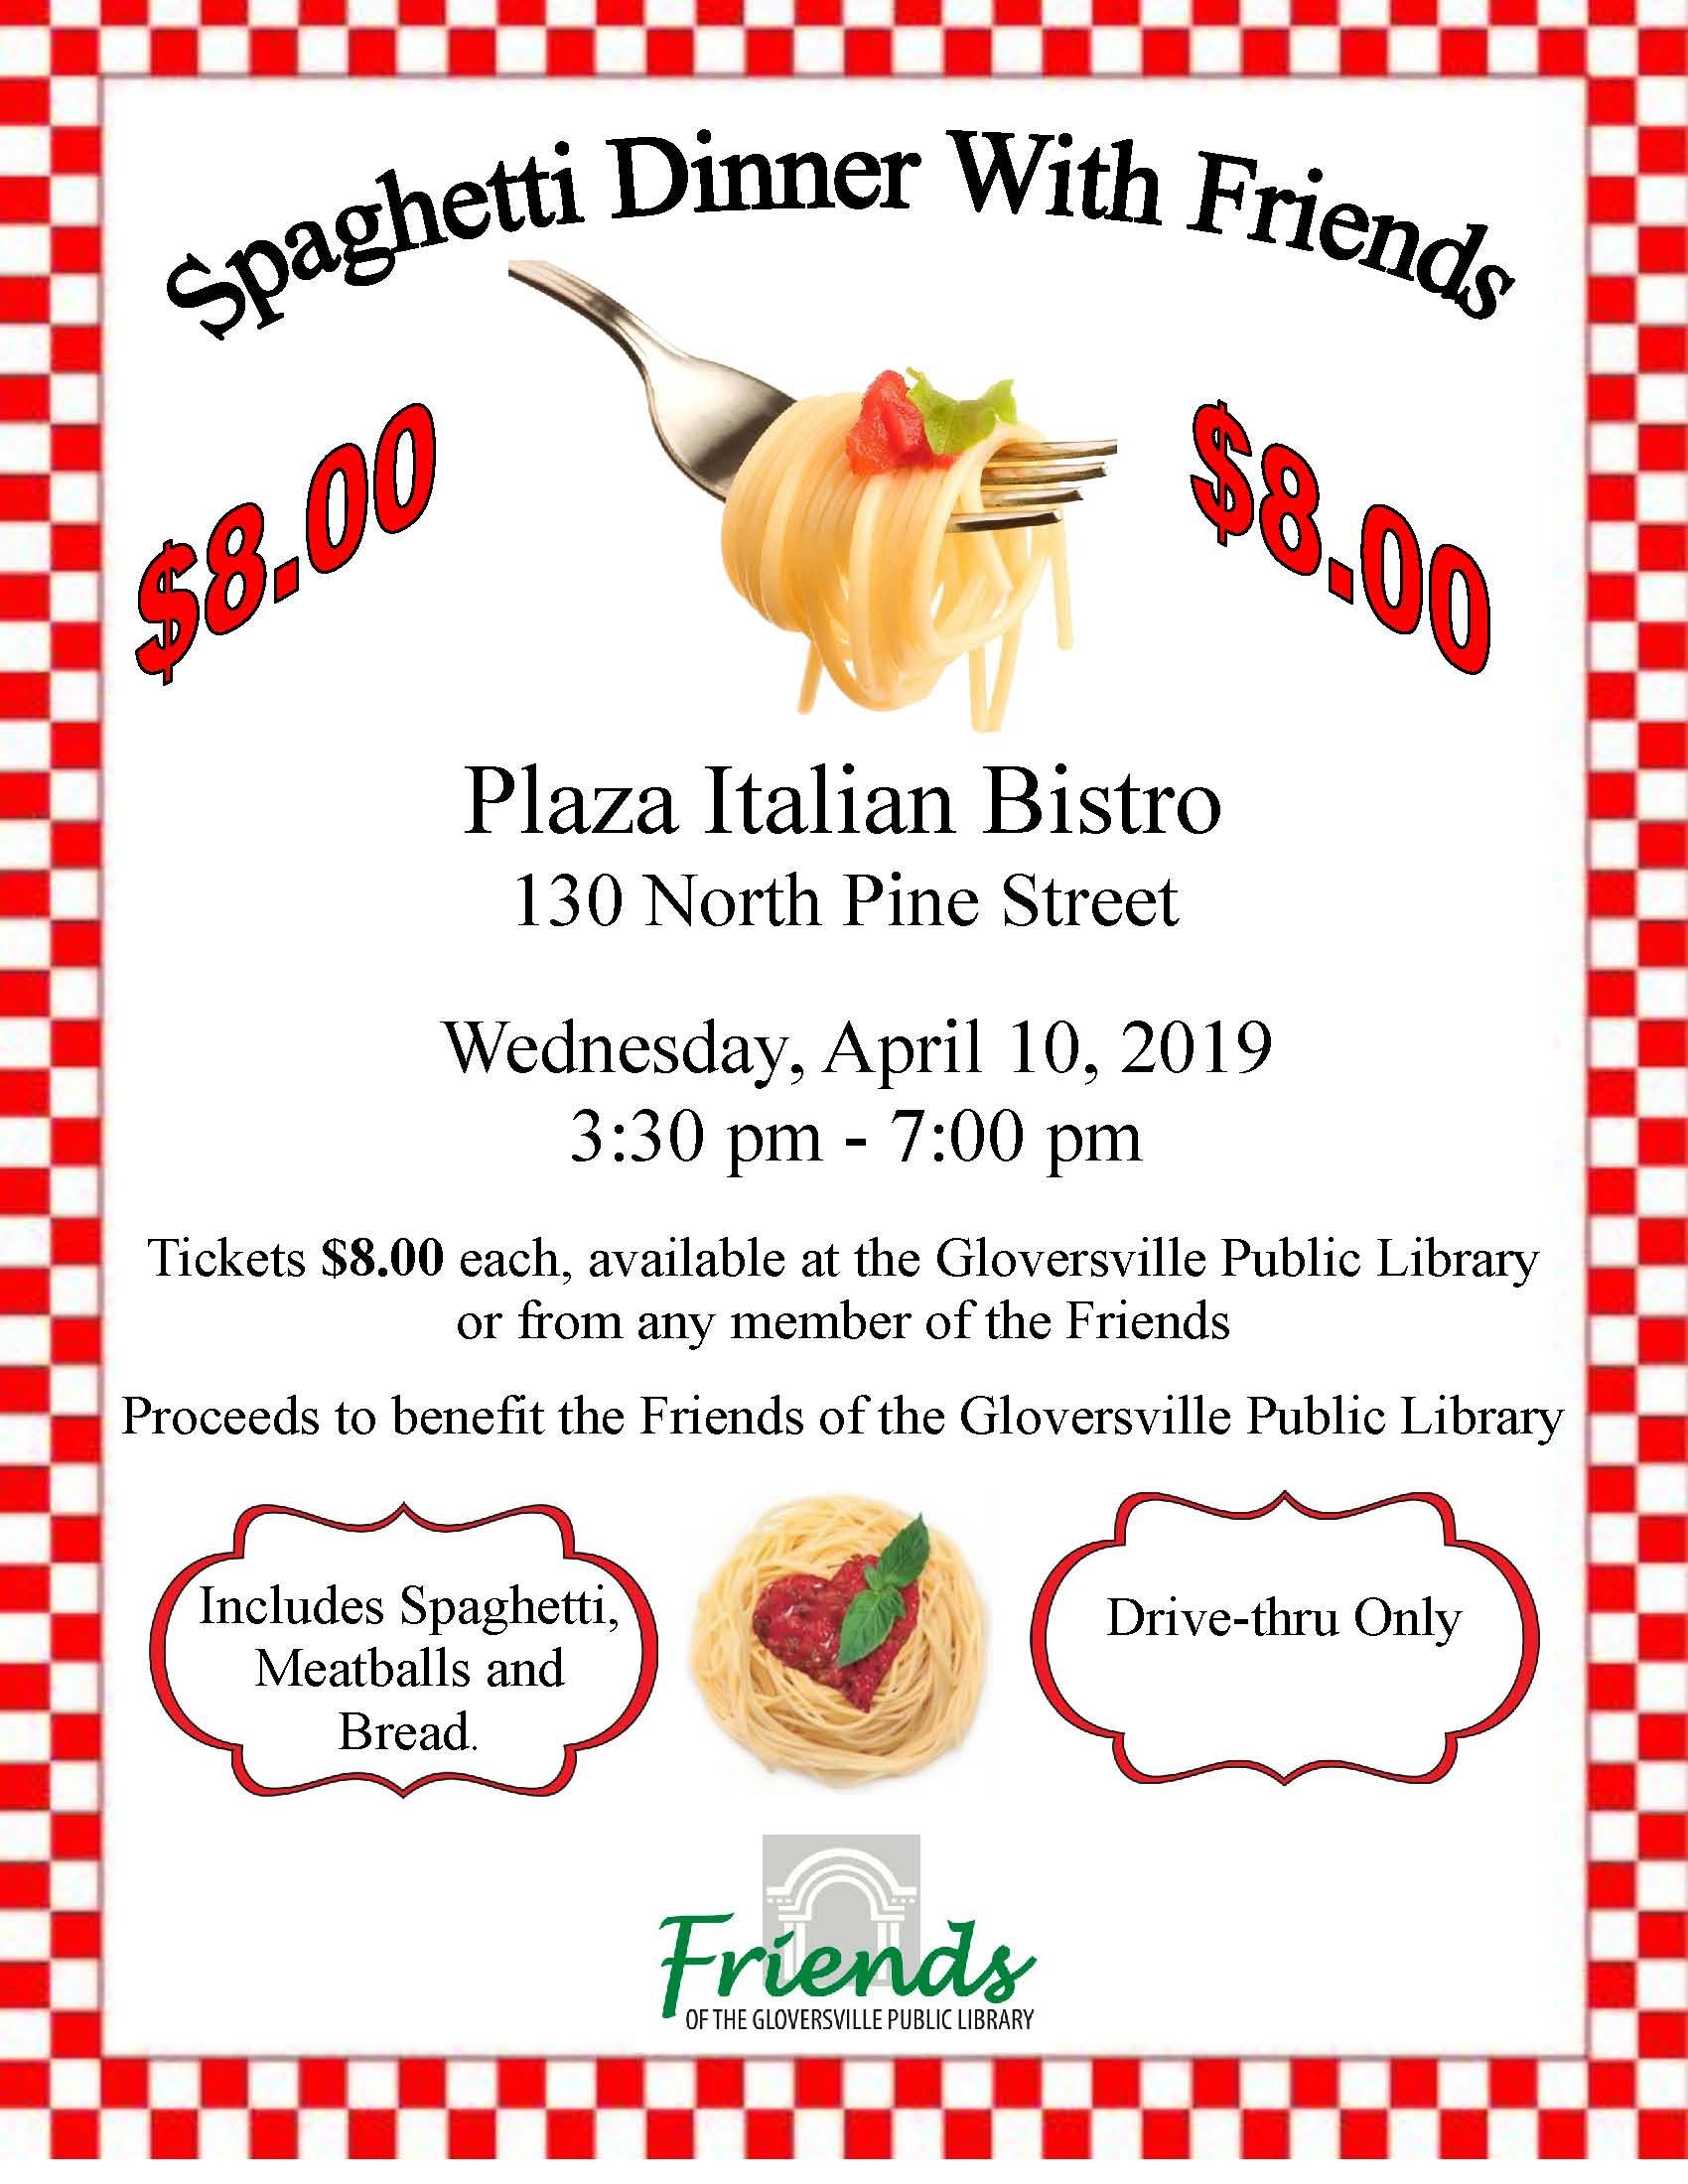 Library Spaghetti Flyer 2019-1.jpg